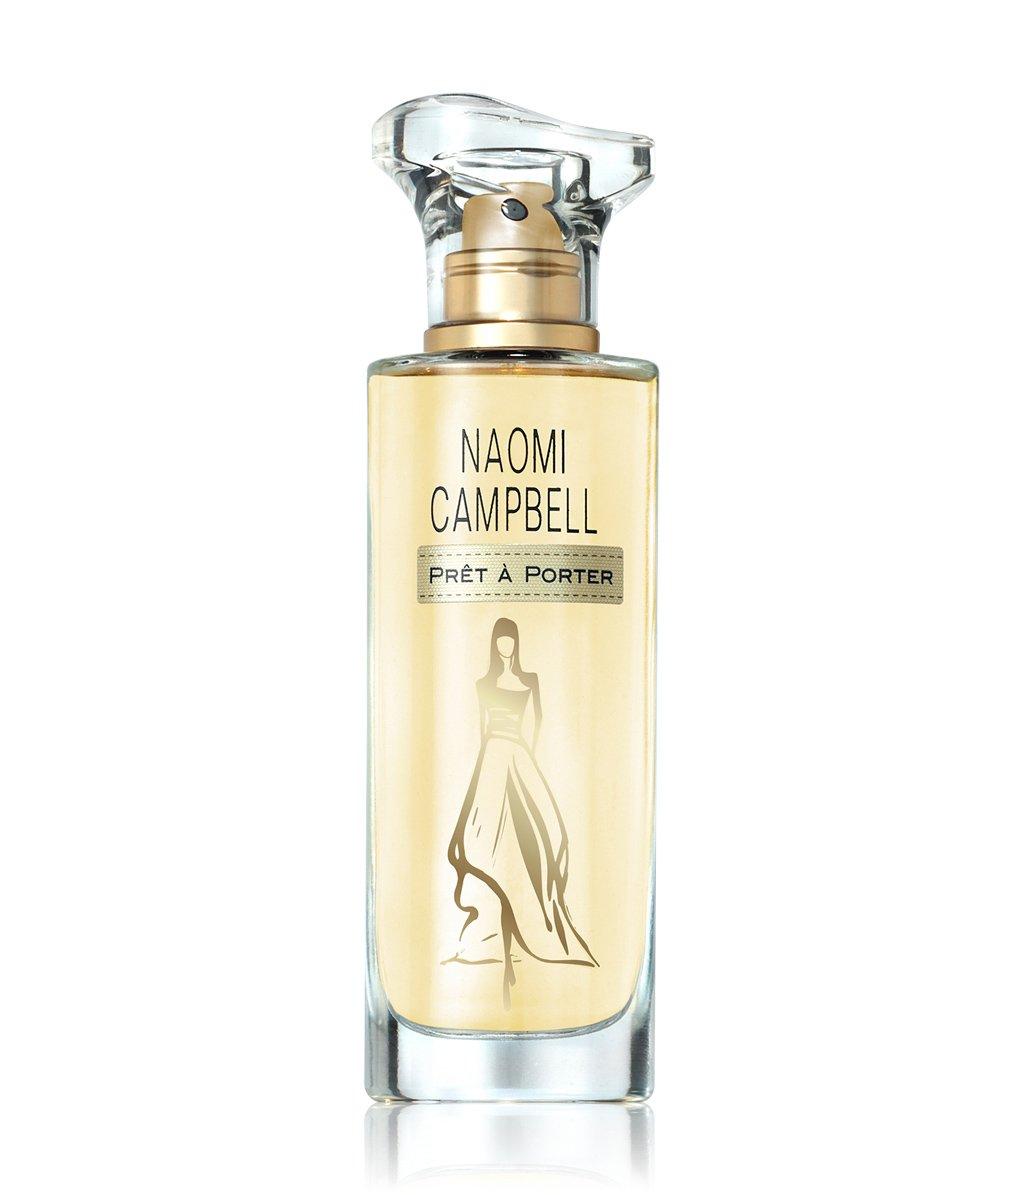 Naomi Campbell Pret a Porter Parfum bestellen | flaconi